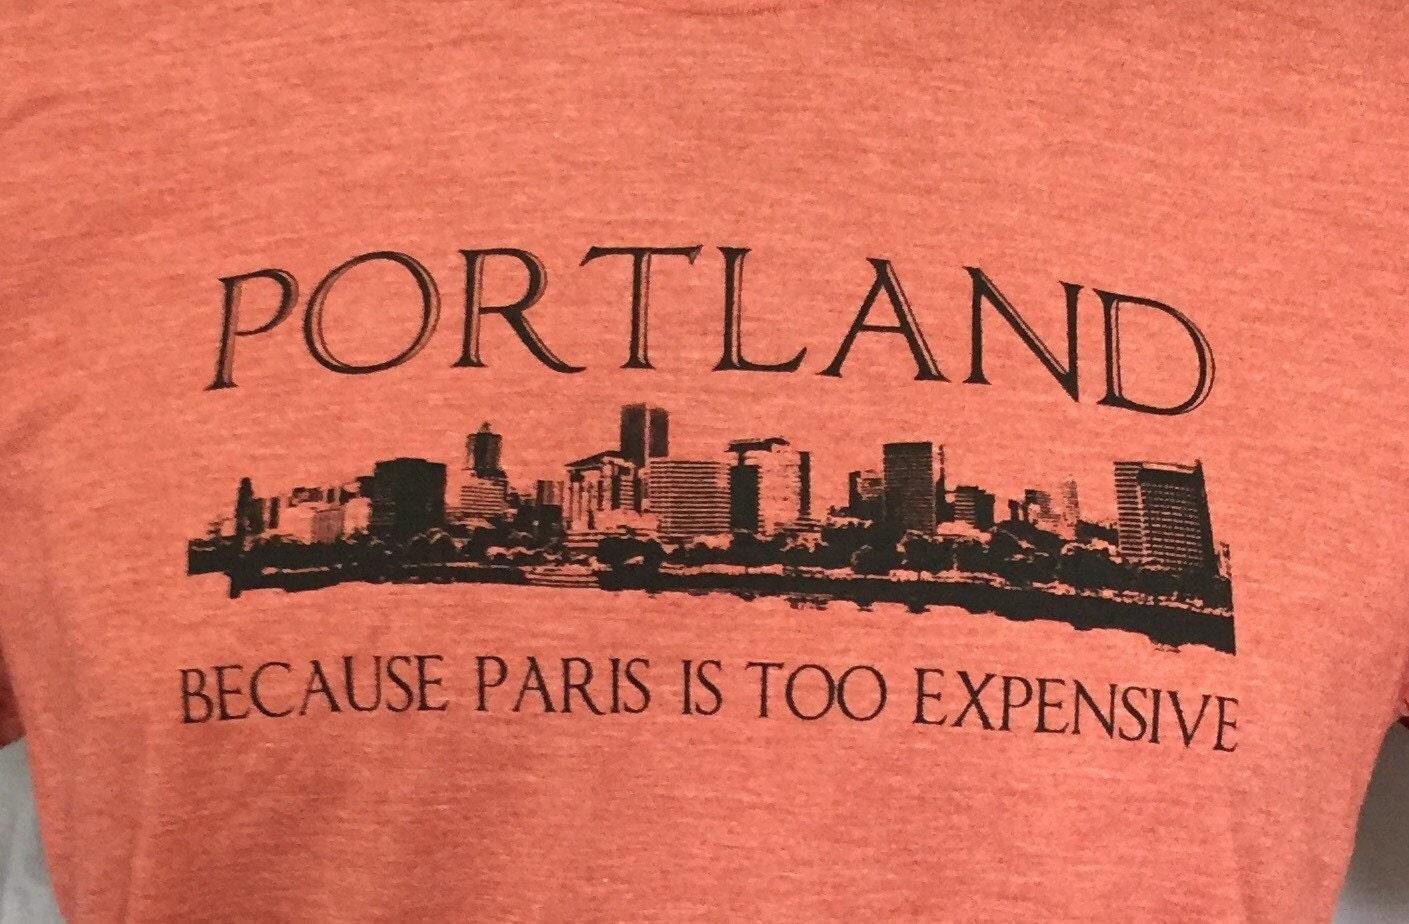 Portland Oregon Paris Funny T Shirt Mens Funny T Shirt Skyline